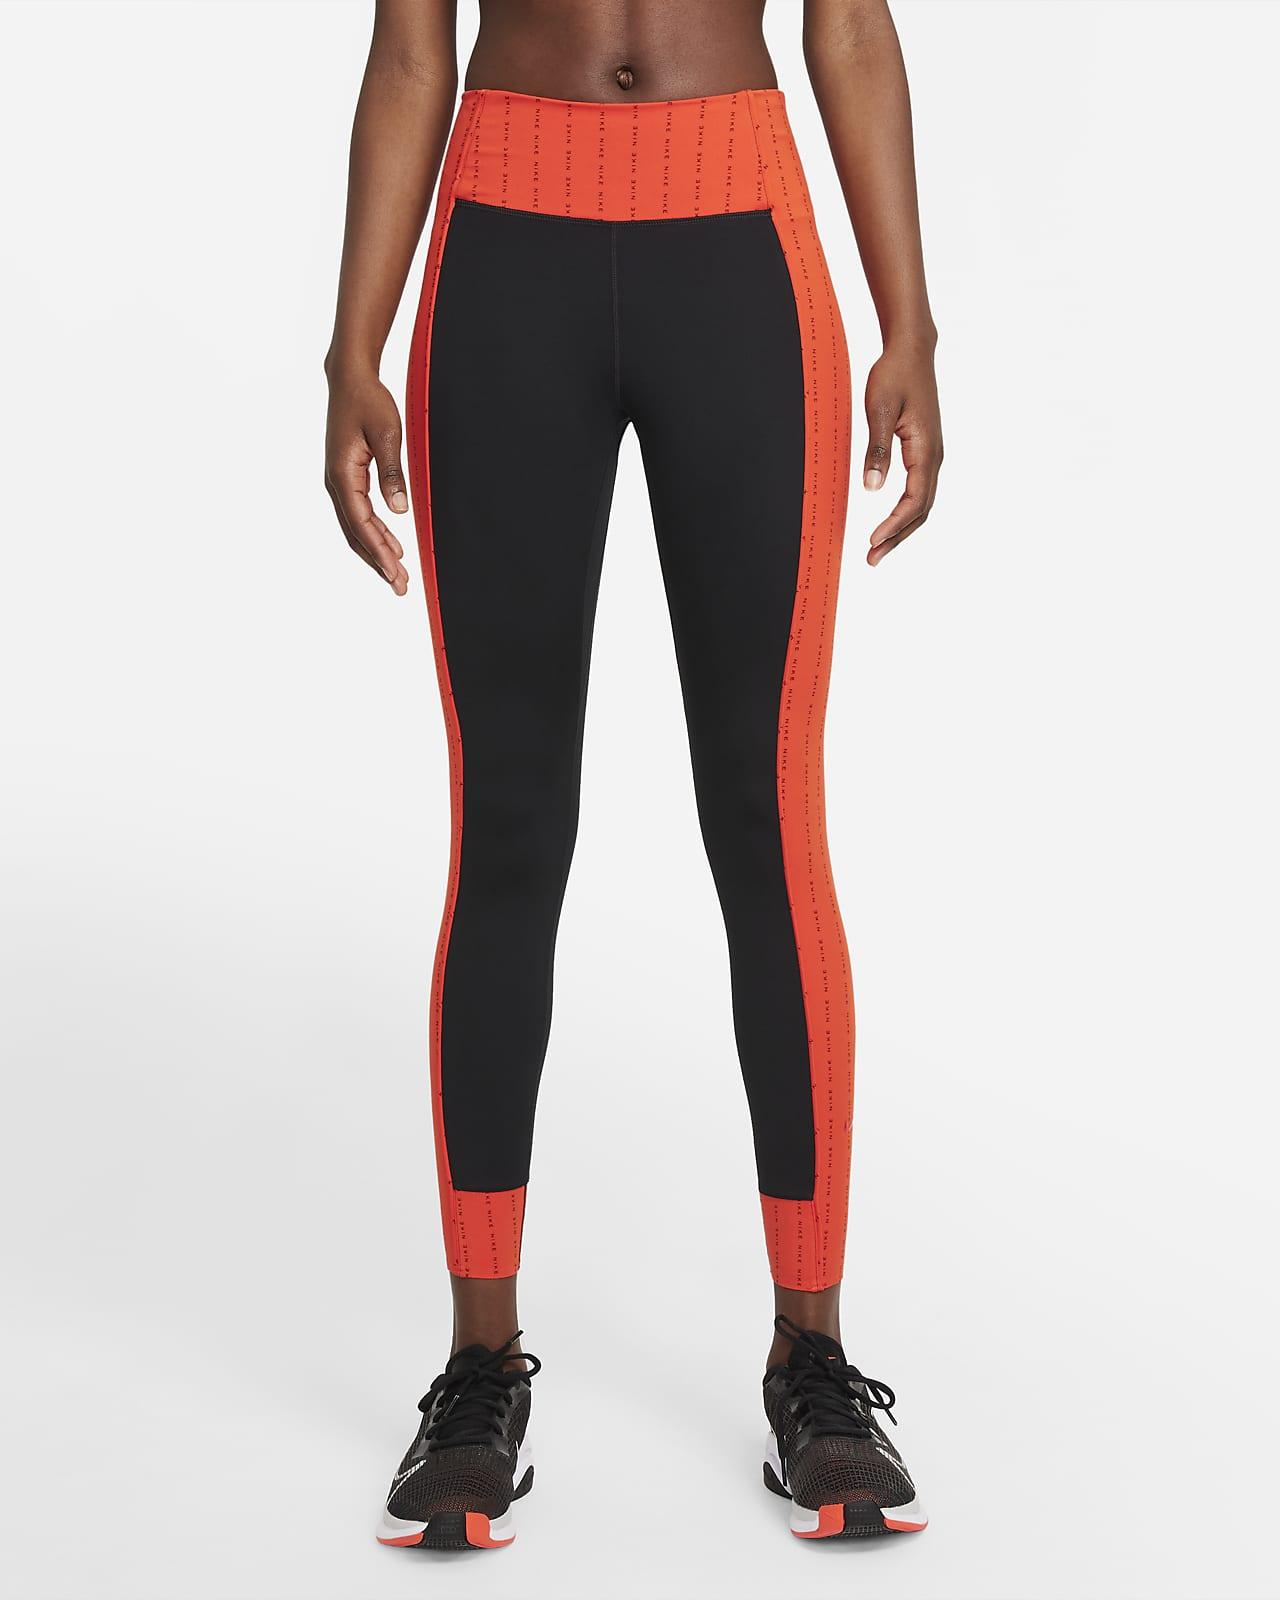 Nike Dri-FIT One Luxe Icon Clash Women's Mid-Rise 7/8 Leggings